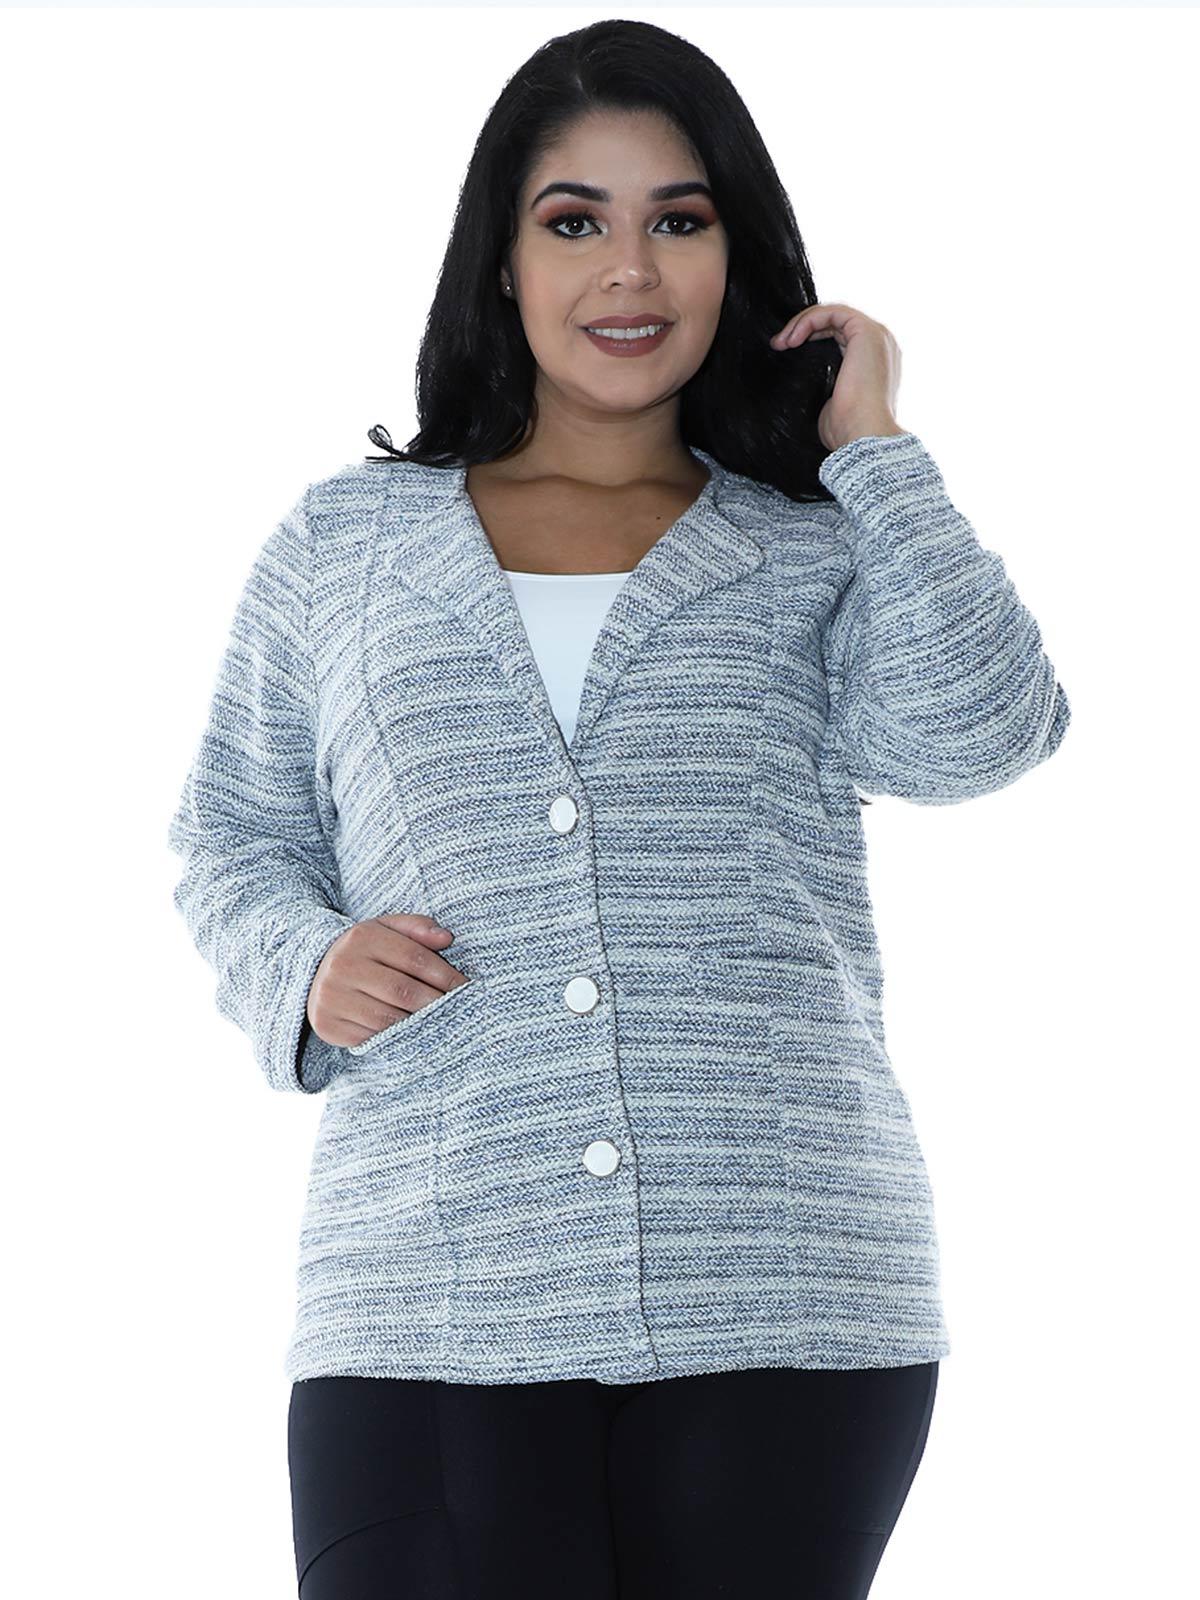 Casaco Plus Size Fleece Tricot Colors Azul Marinho